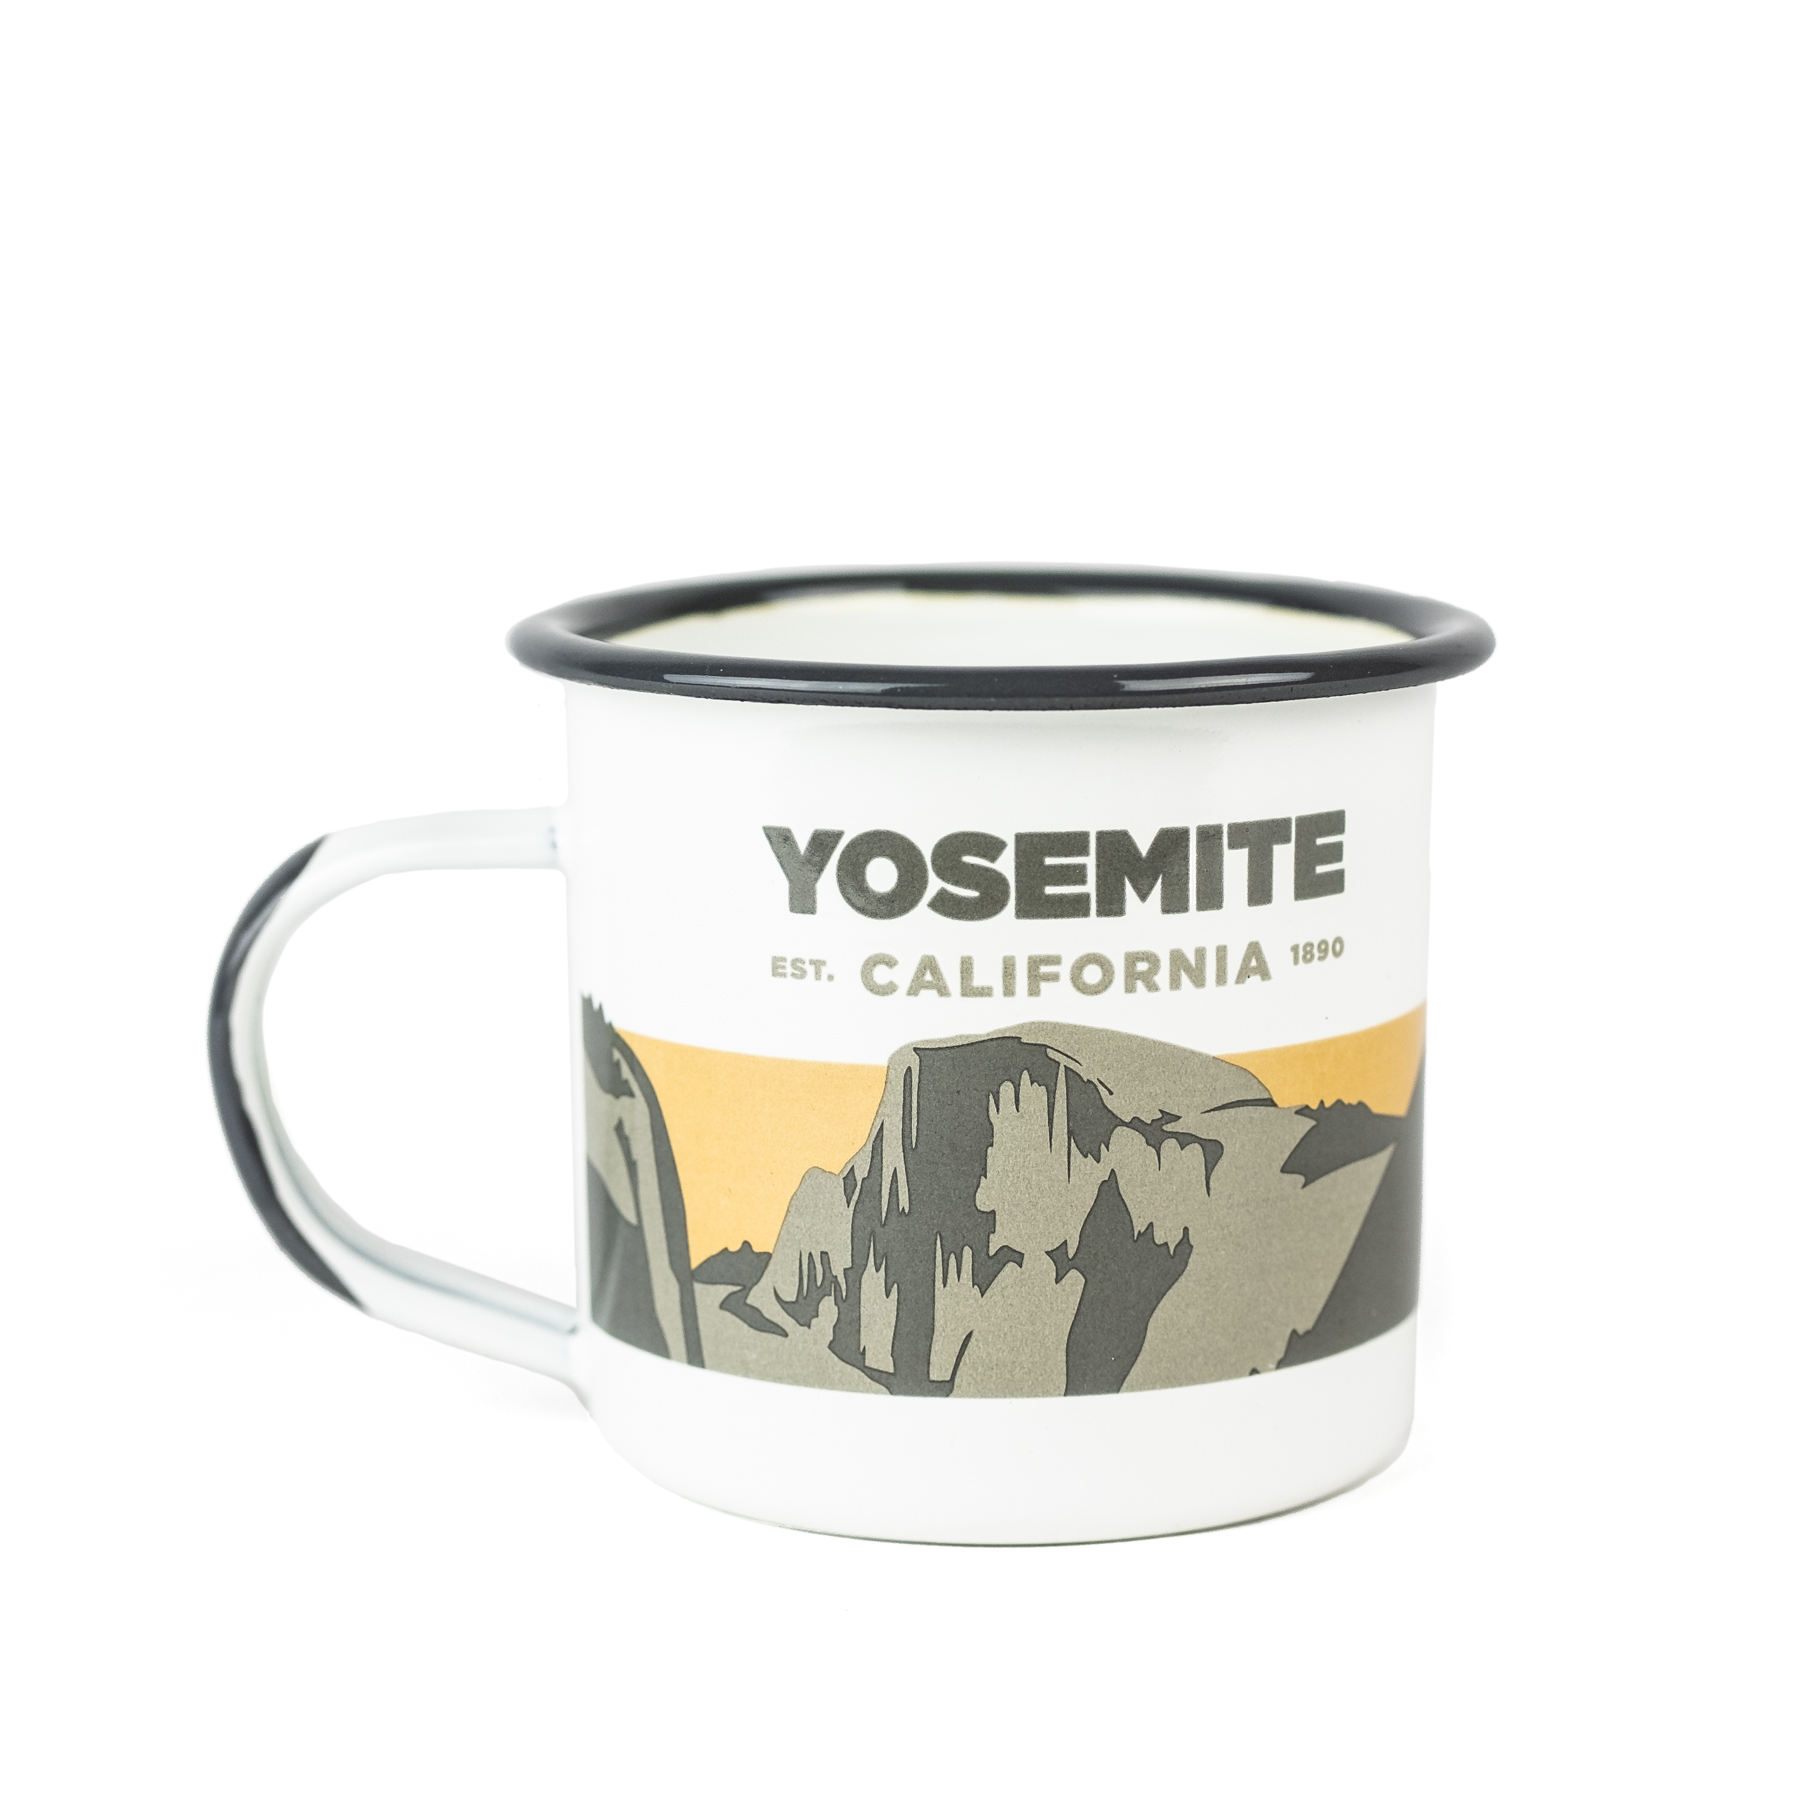 yosemite-enamel-mug-3.jpg